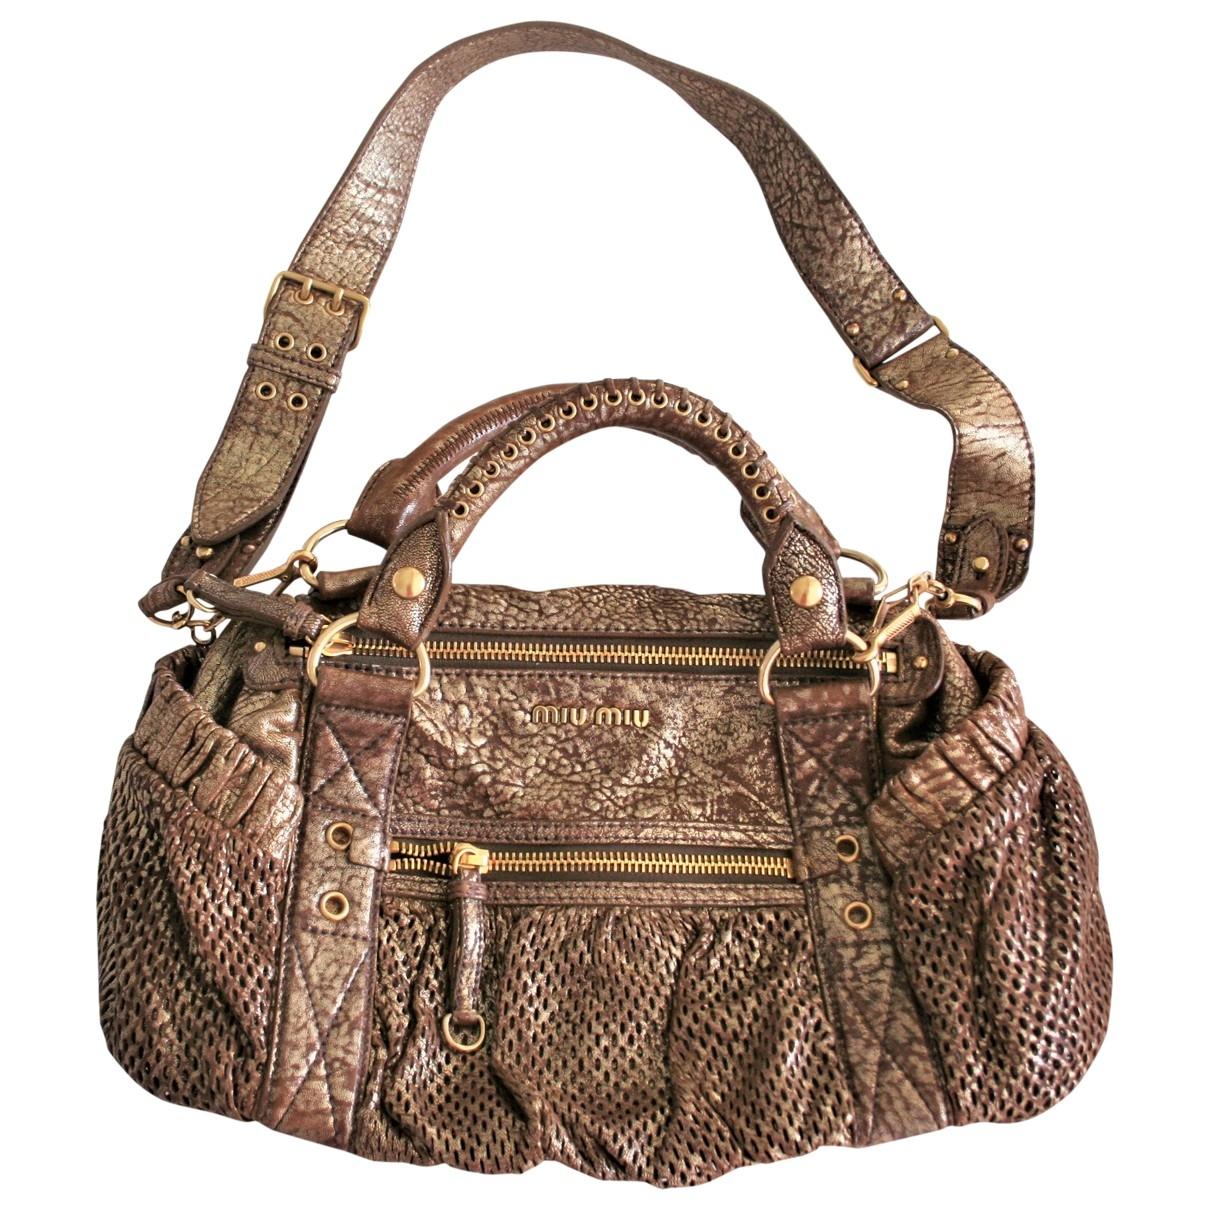 Miu Miu \N Gold Leather handbag for Women \N